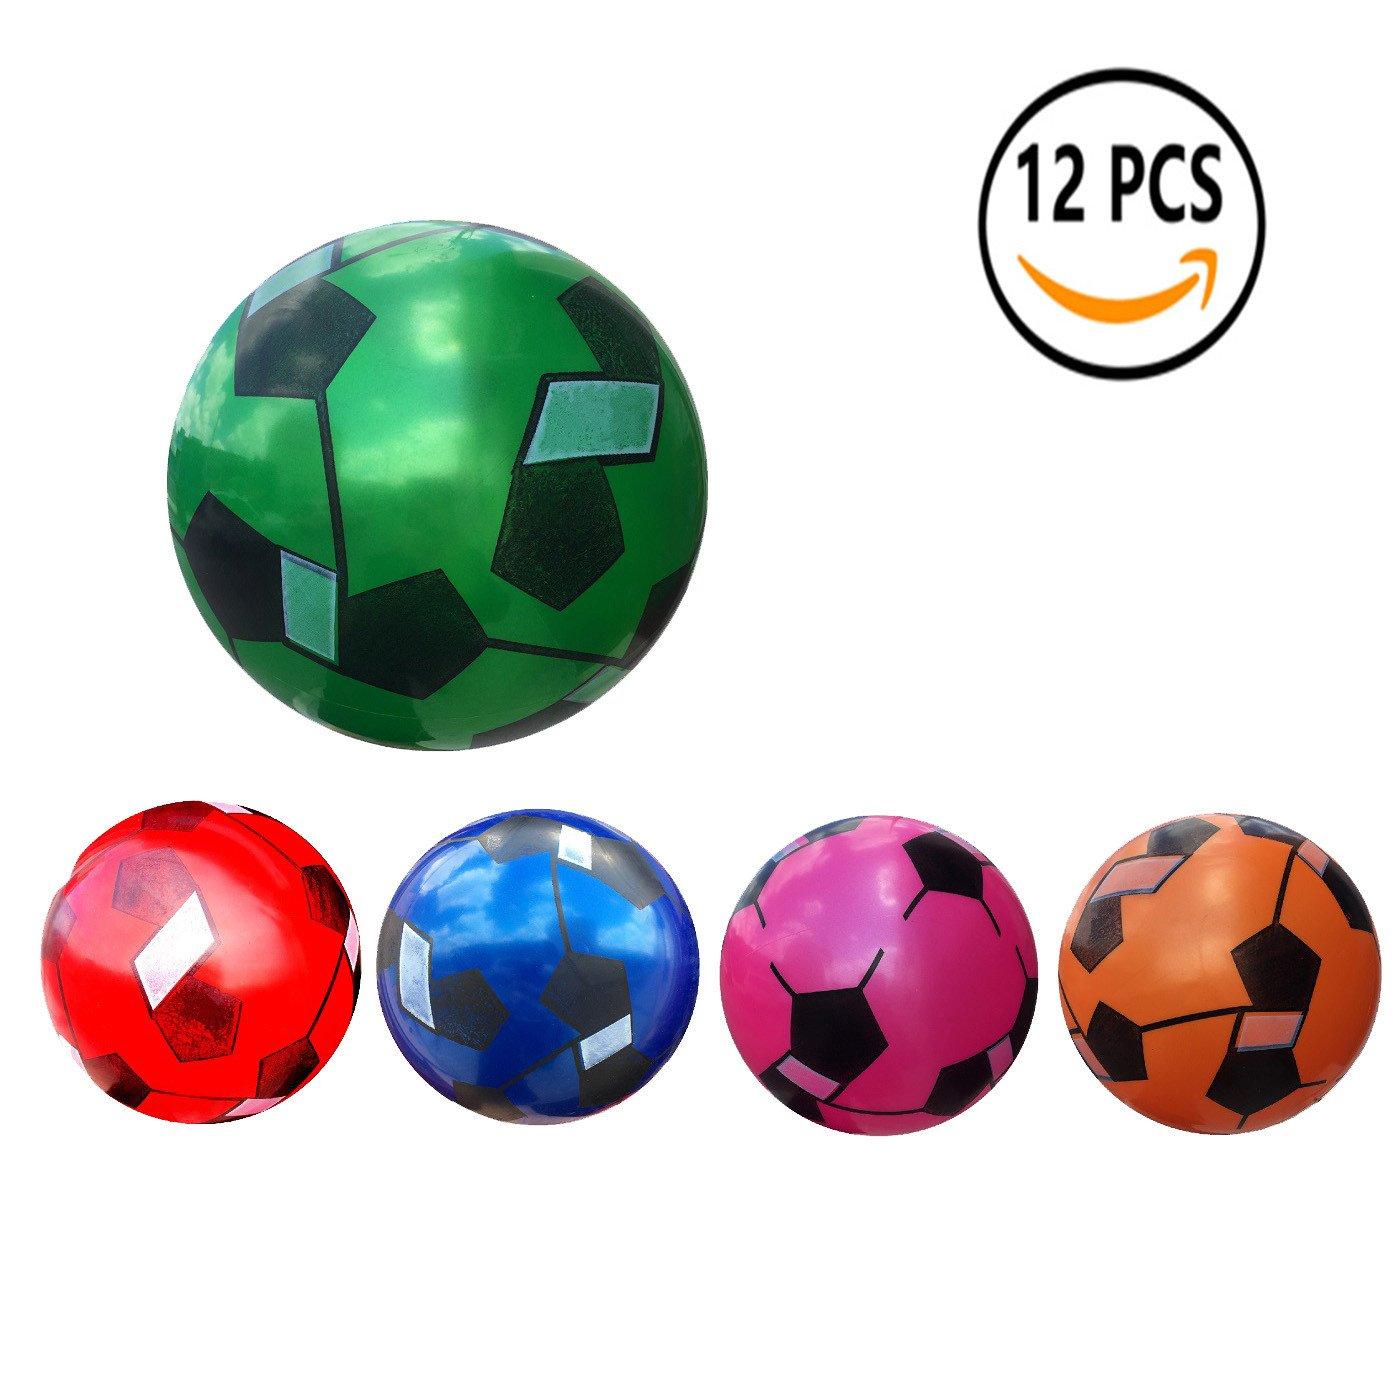 12 Pcs Juguete De Pelota De Playa De Balon 22CM (Fútbol de colores ...